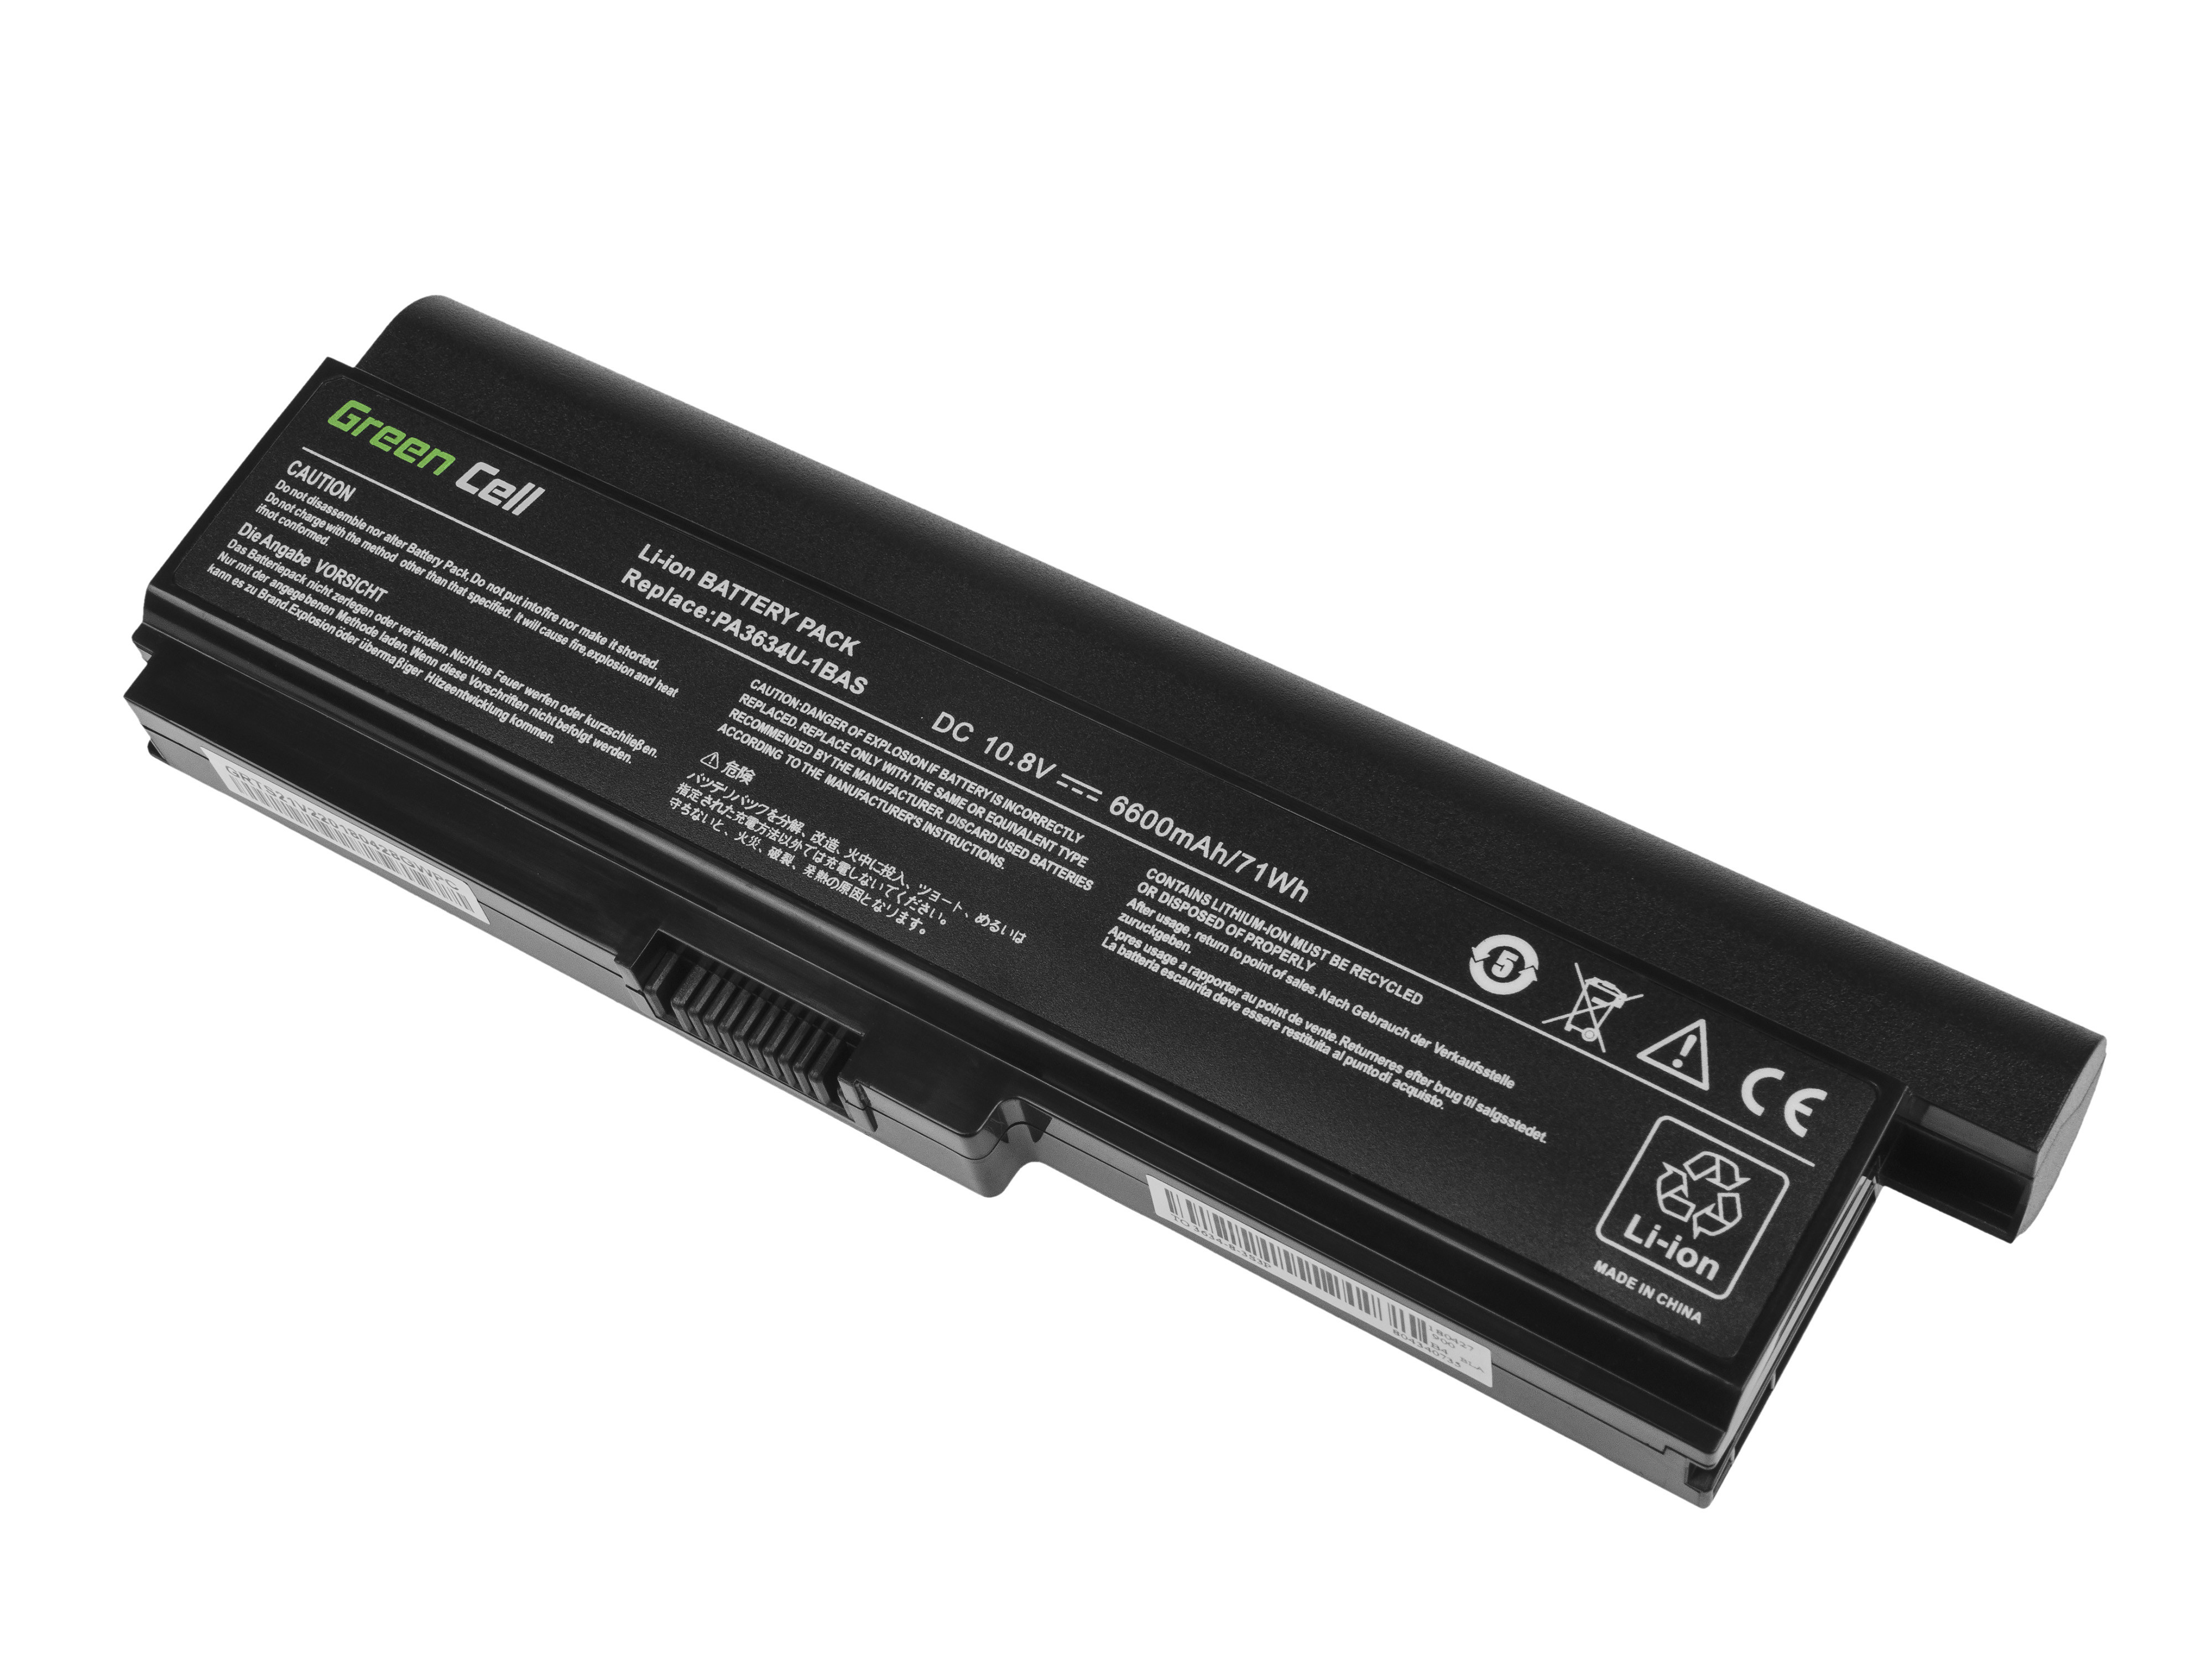 Green Cell TS21V2 Baterie Toshiba Satellite A660 A665 L650 L650D L655 L670 L670D L675 M300 M500 U400 U500 6600mAh Li-ion - neoriginální